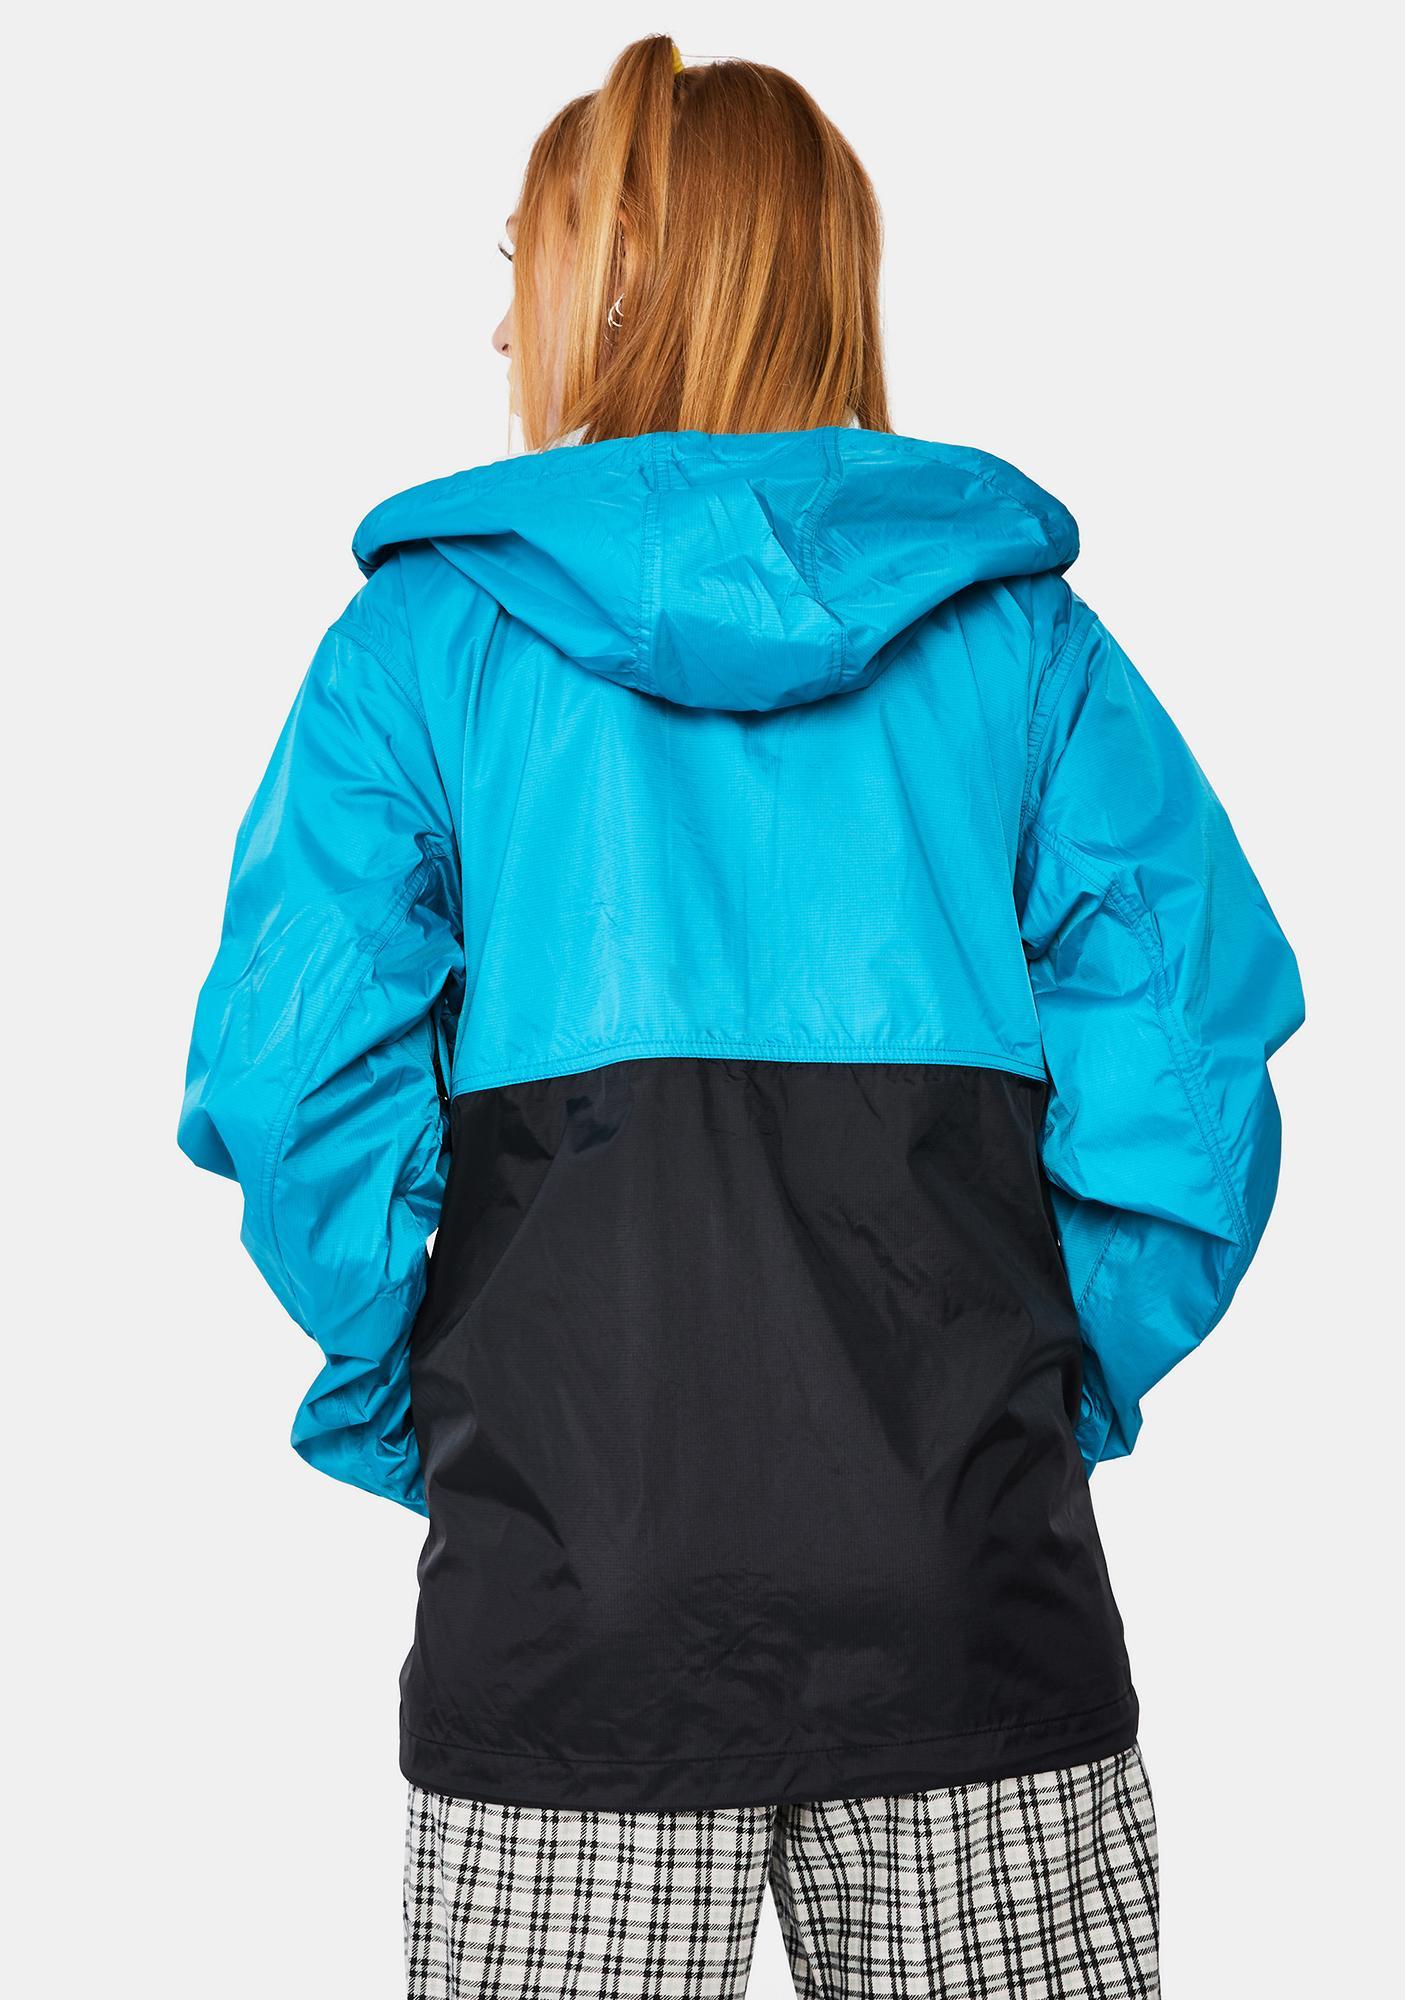 Obey Global Zip Up Jacket